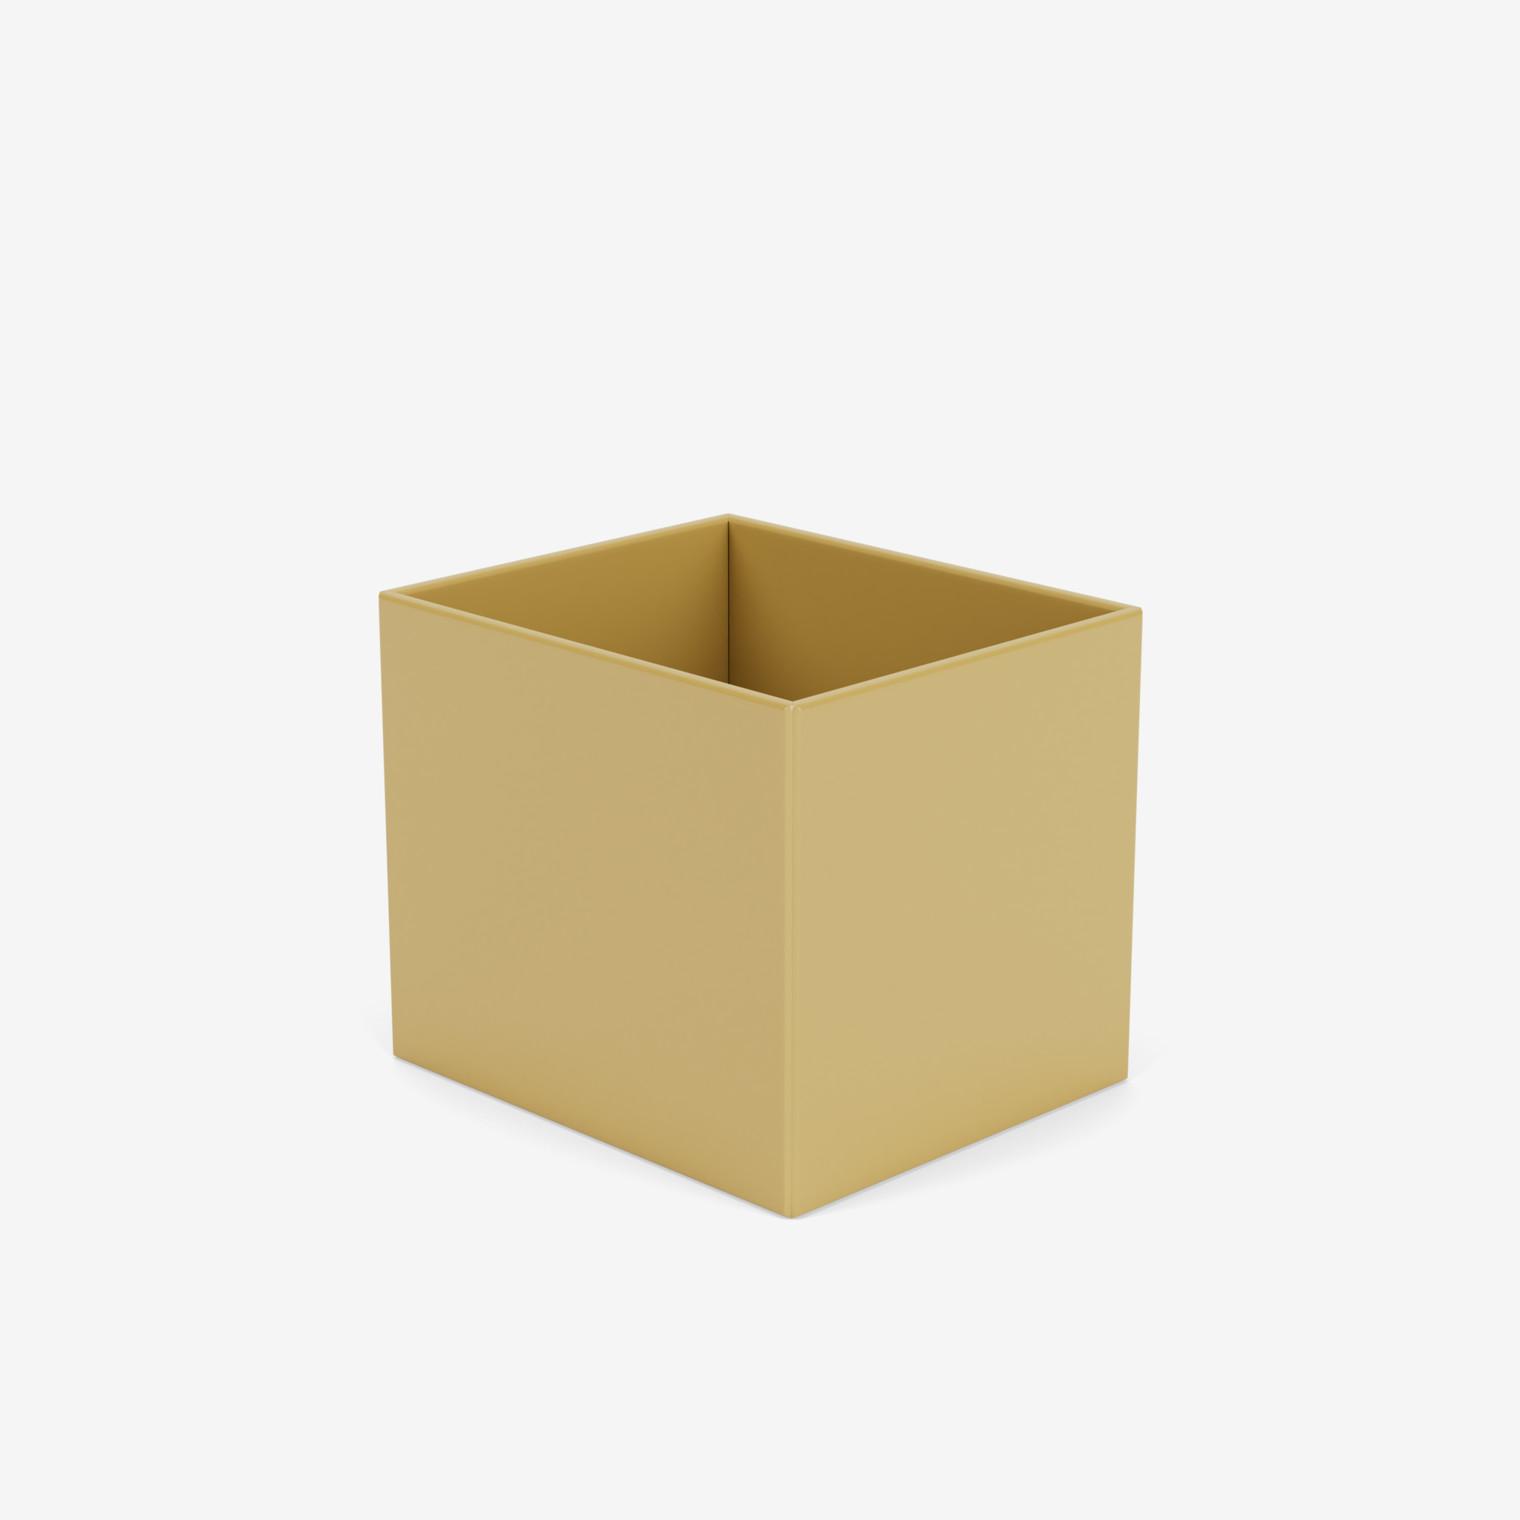 Living Things LT3061 Pflanzenbox